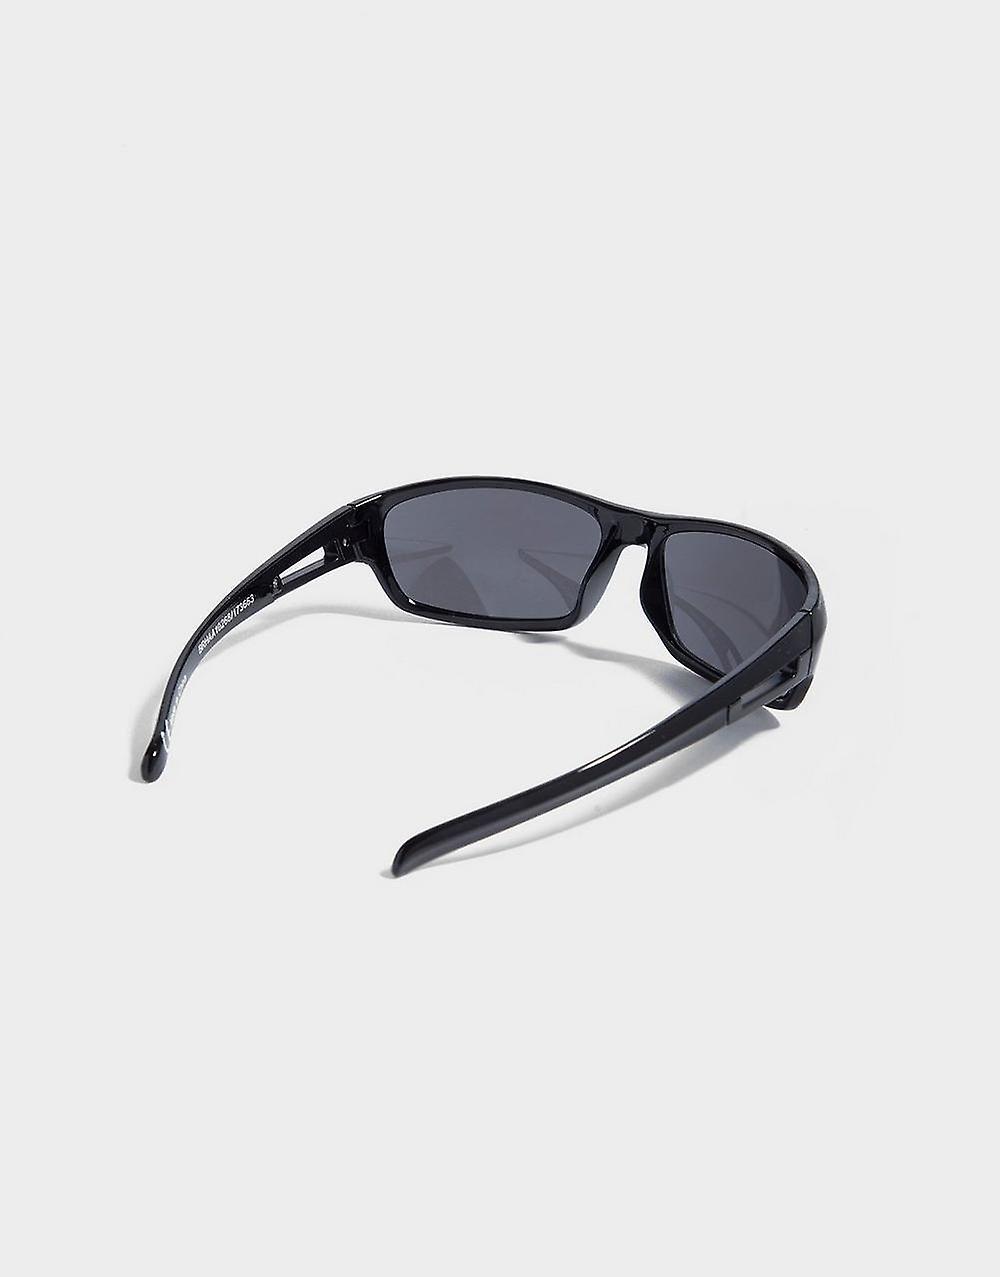 New Brookhaven Men's Spencer Sunglasses Black